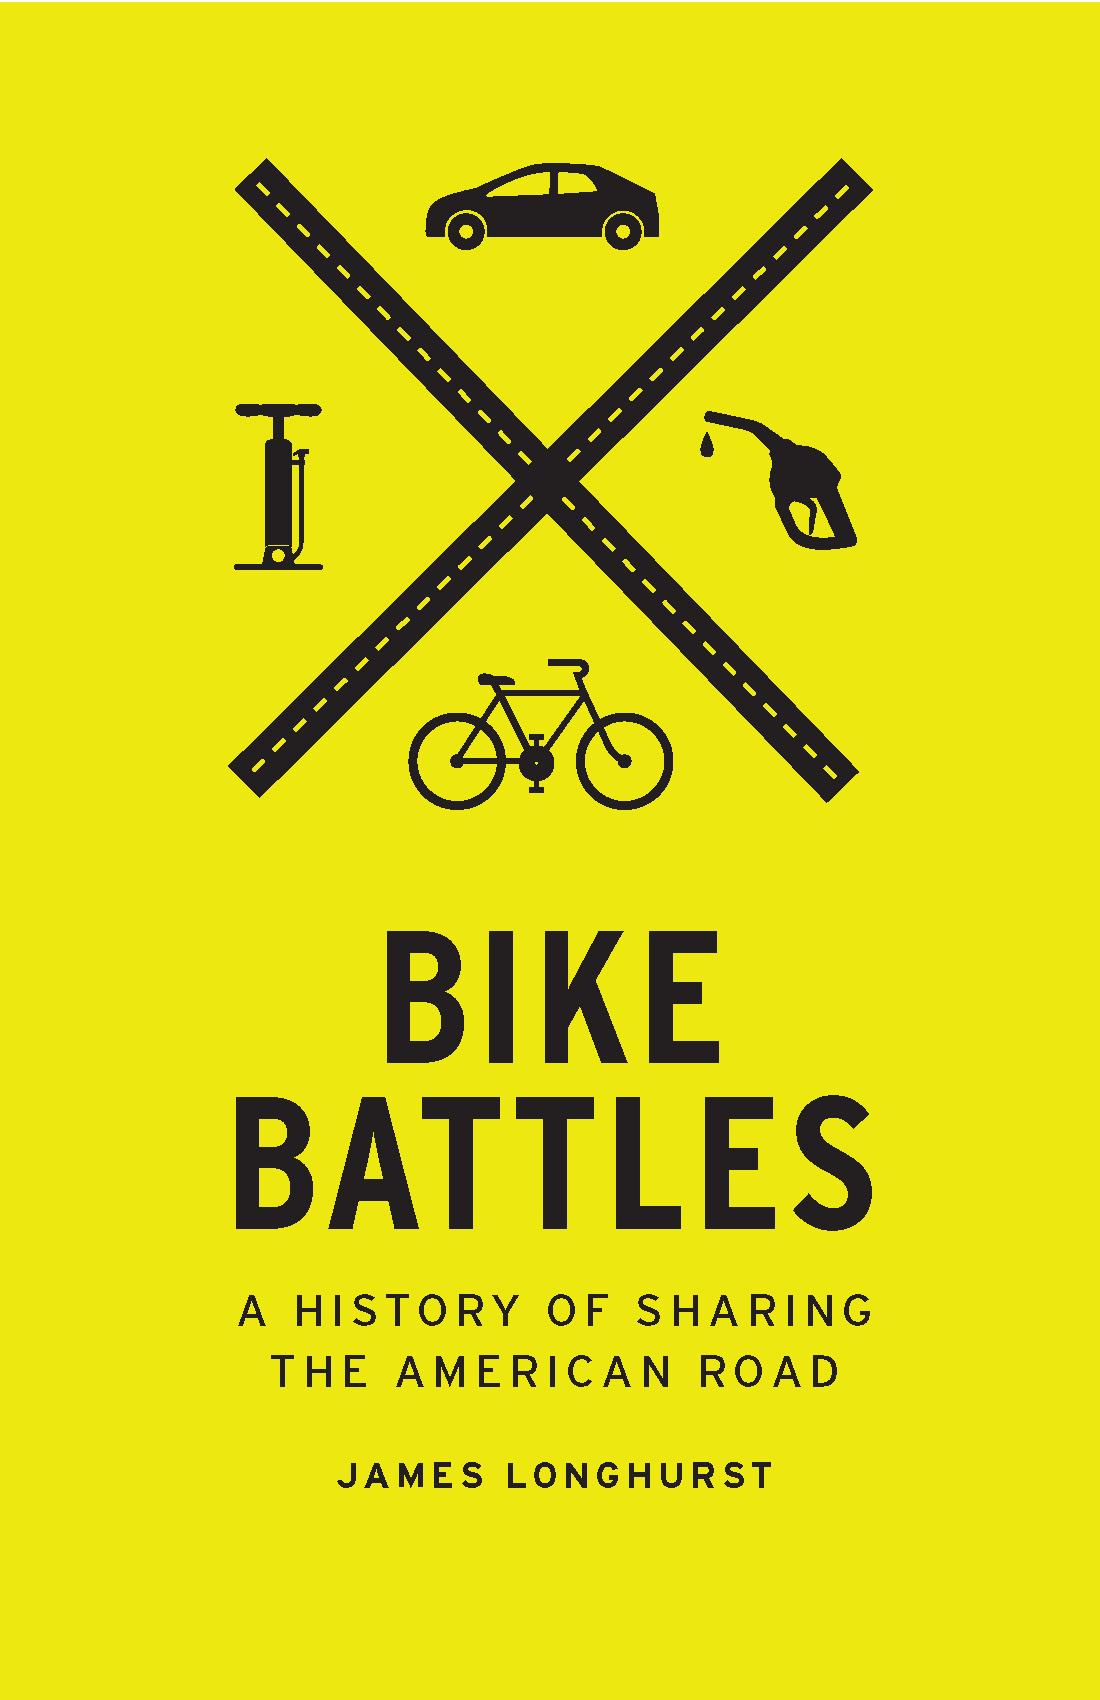 Bike Battles book cover. (University of Washington Press, 2015)